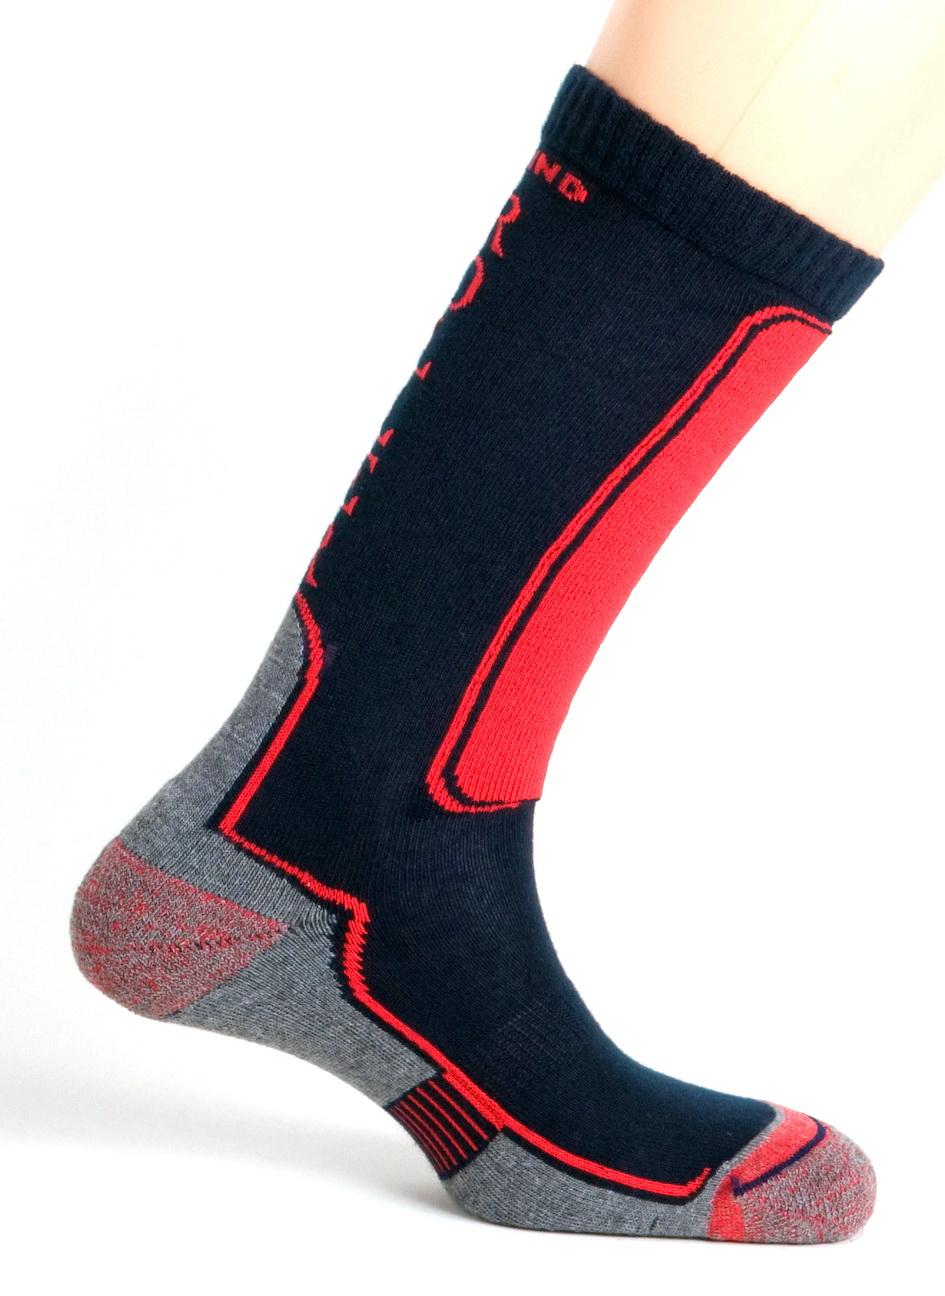 Носки MundНоски для лыж и сноуборда<br>Тип: для роликов, Размер: L, Пол: унисекс<br>